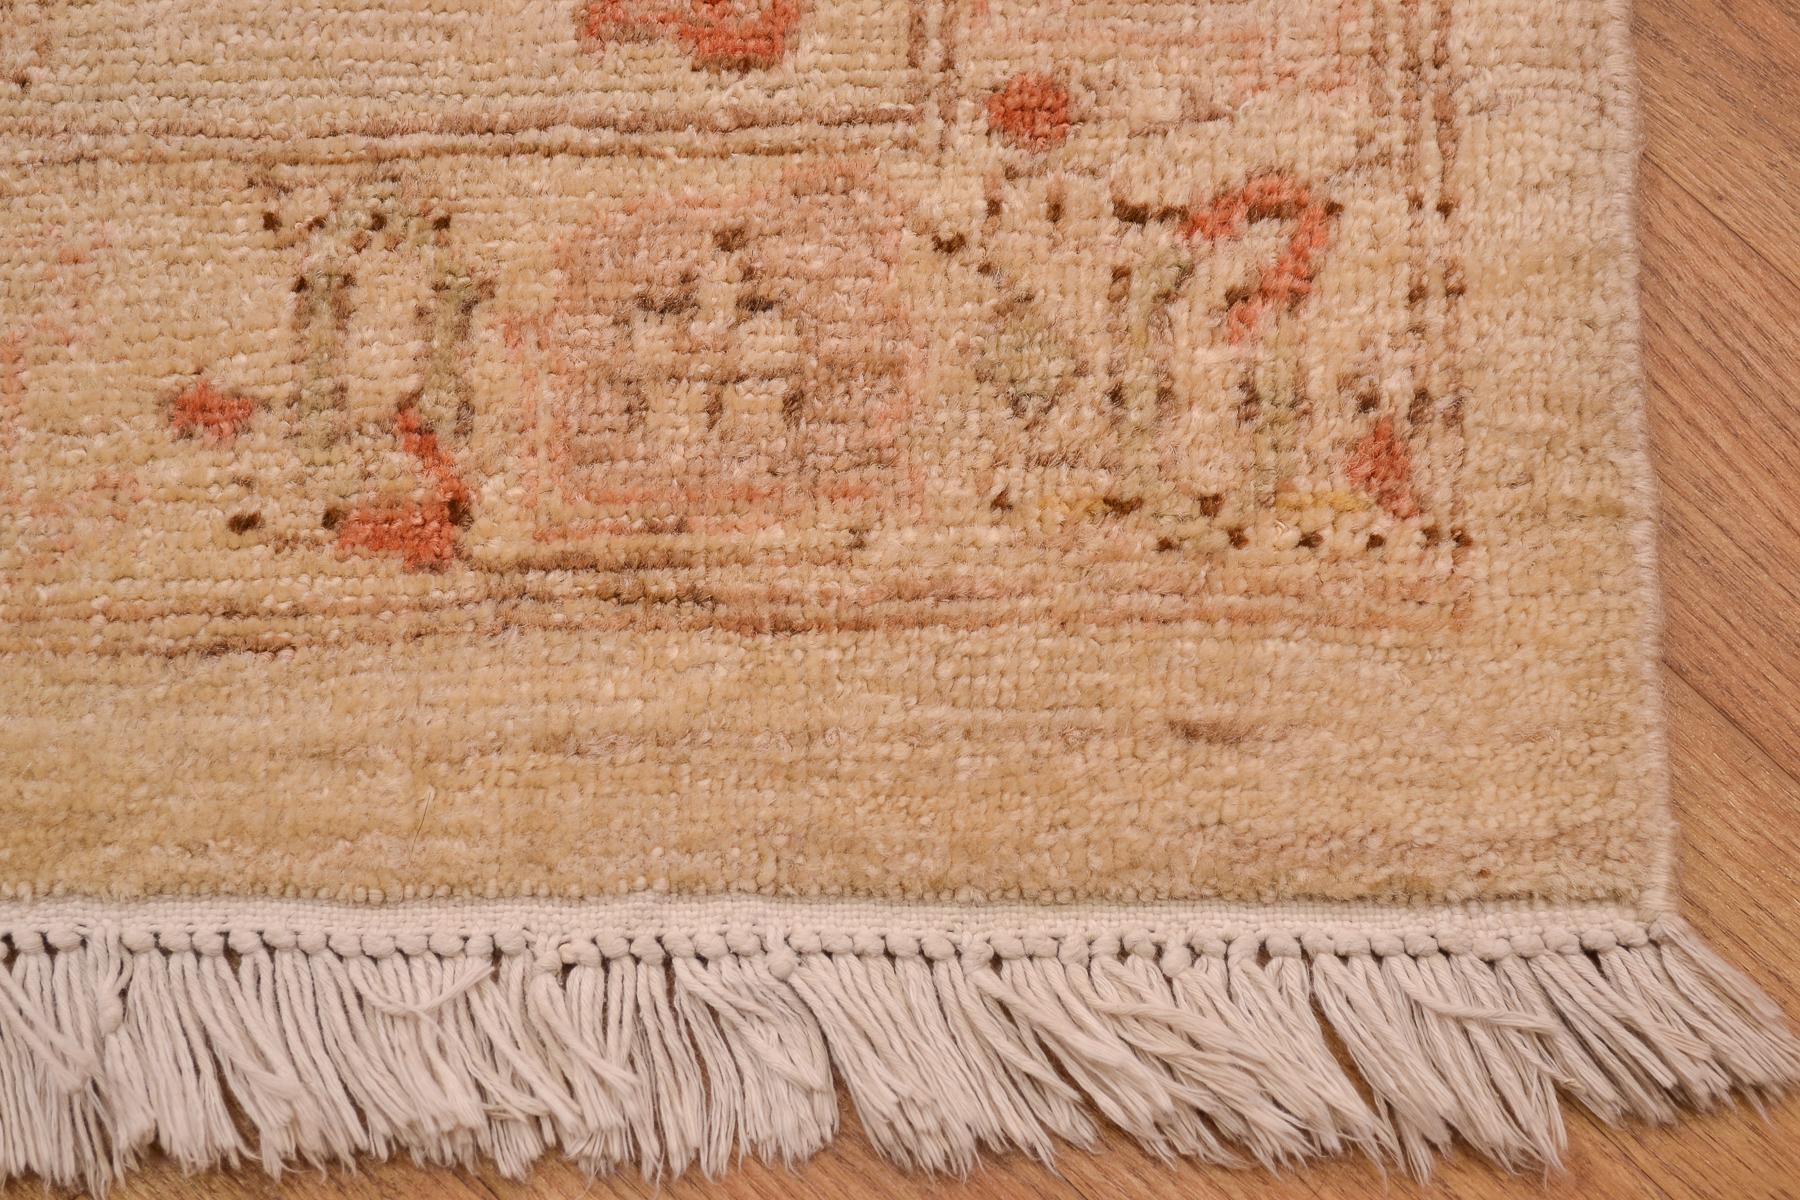 Garous Square Carpet 2 44x2 48m The Oriental Rug Merchant